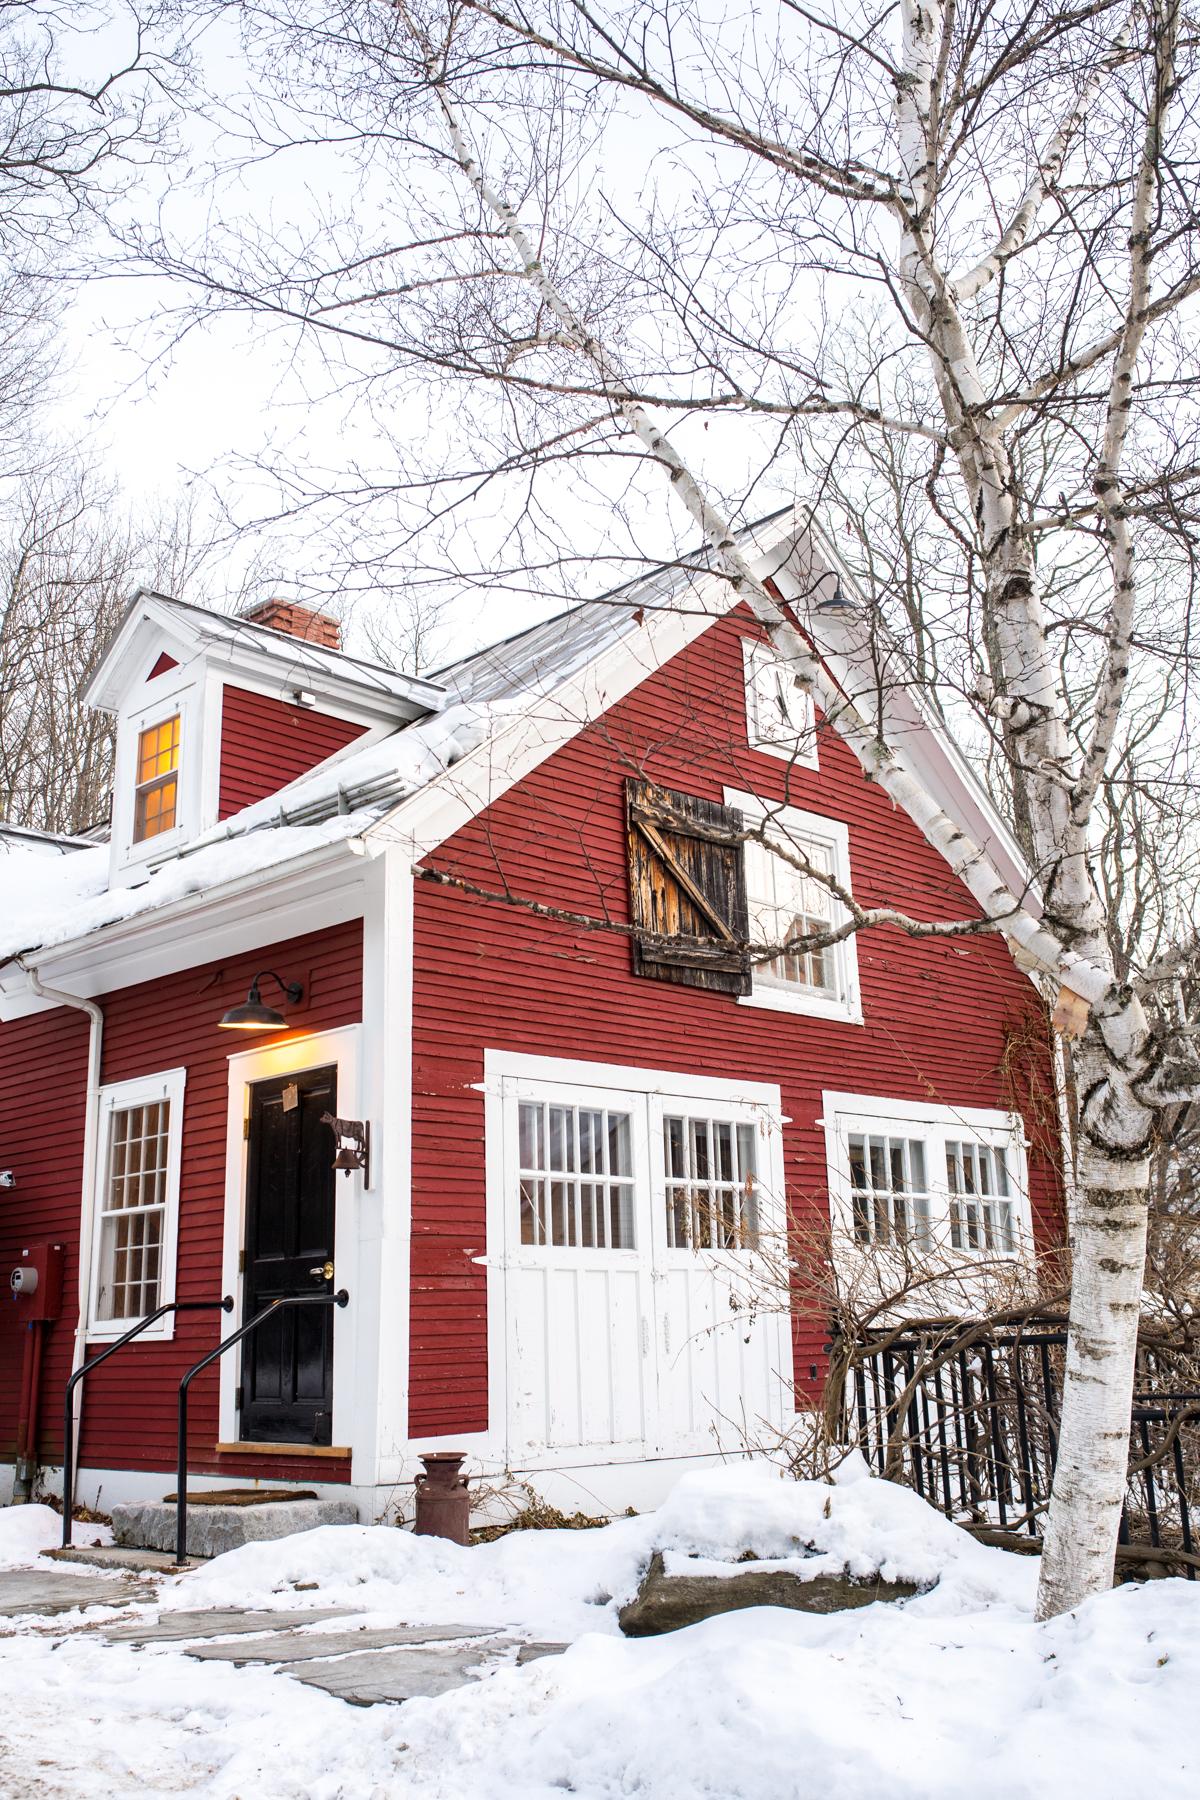 Stacie Flinner x The Pitcher Inn Relais Chateaux Vermont-29.jpg